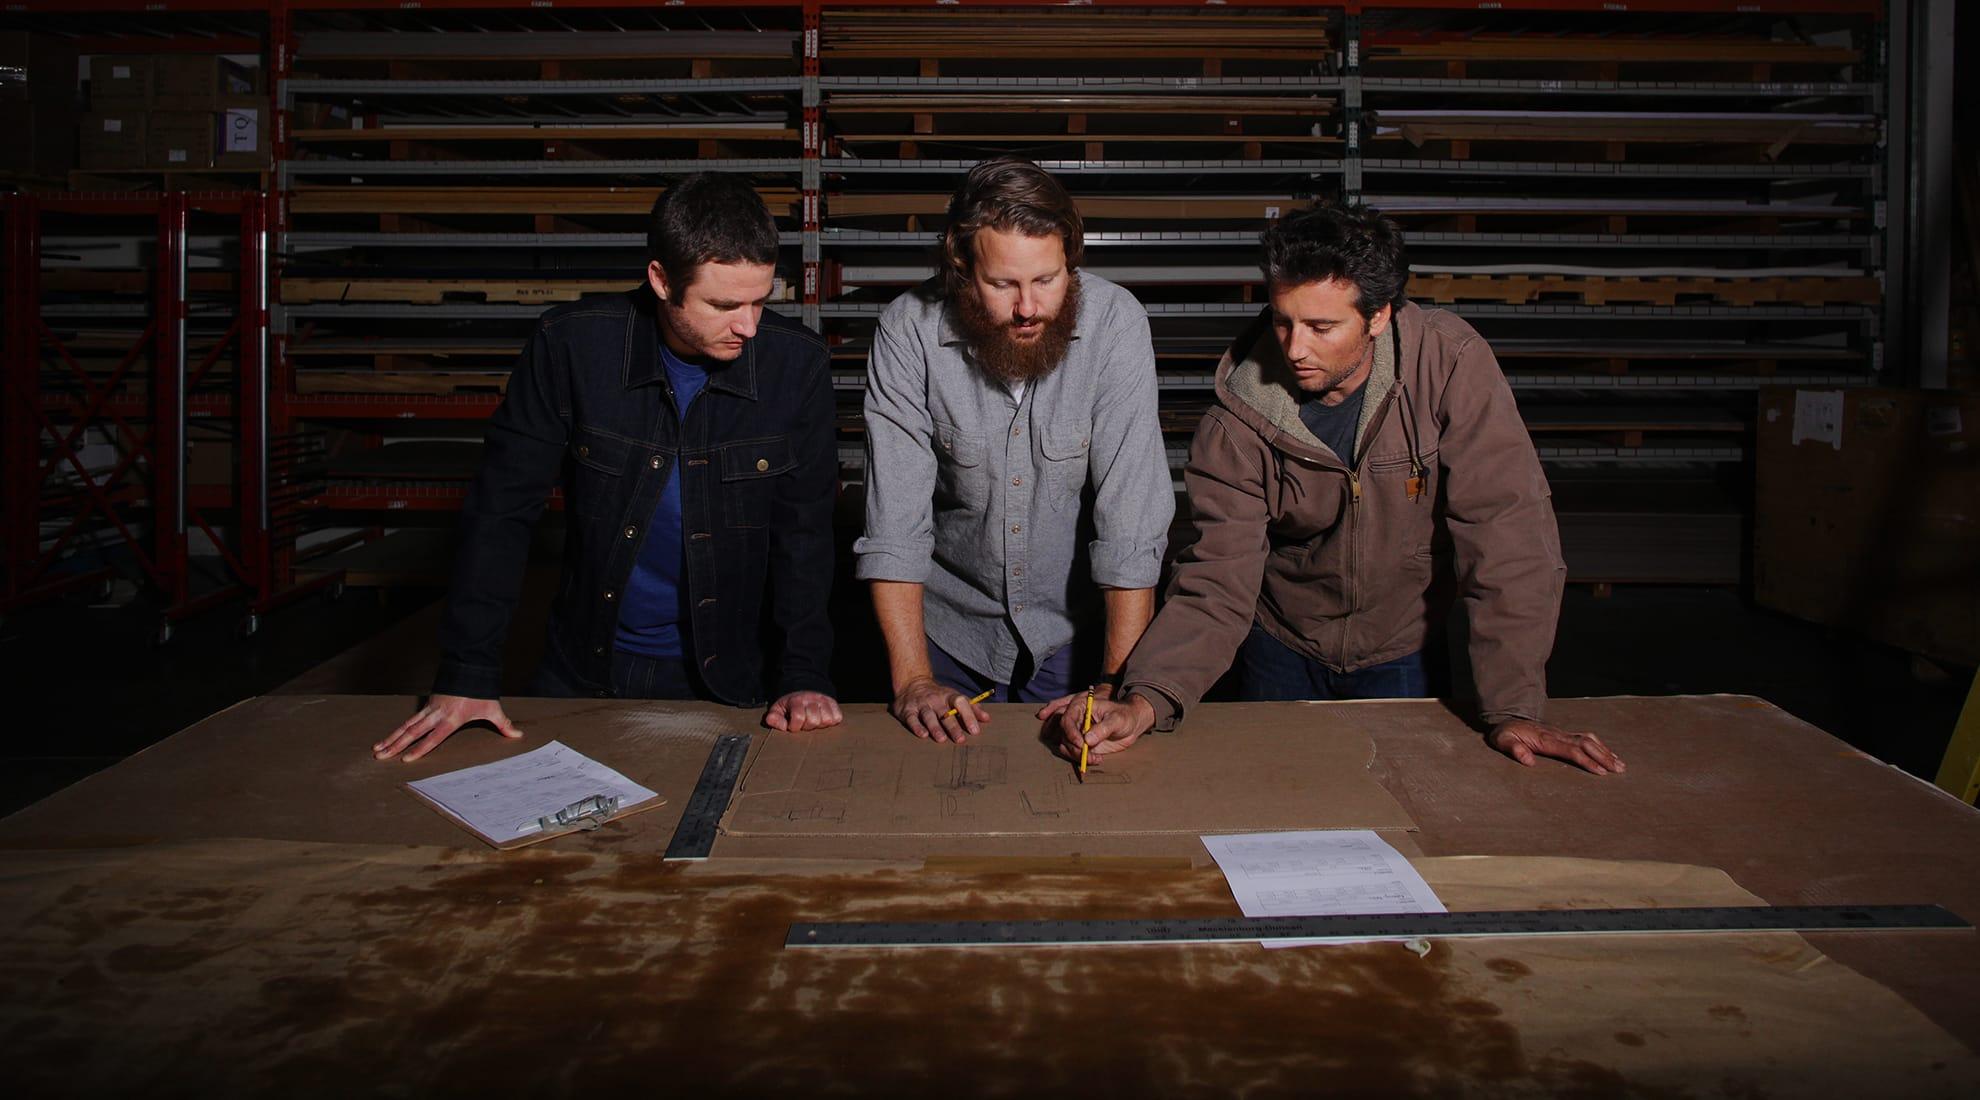 Cerno founders Bret Englander, Nick Sheridan and Daniel Wacholder.